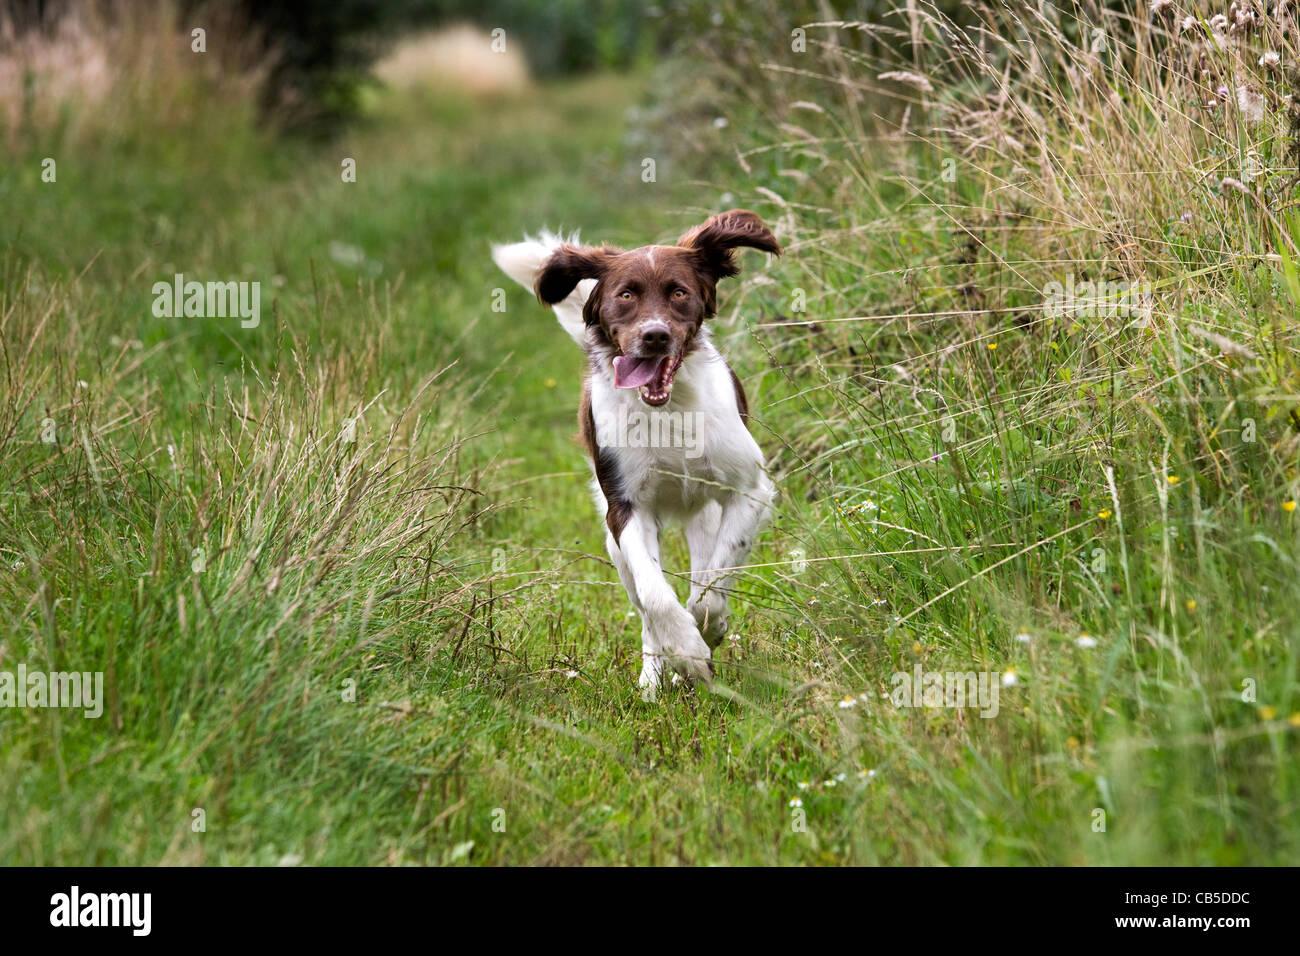 Drentsche Patrijshond / Dutch Partridge Dog / Drent spaniel type hunting dog running in field, the Netherlands - Stock Image